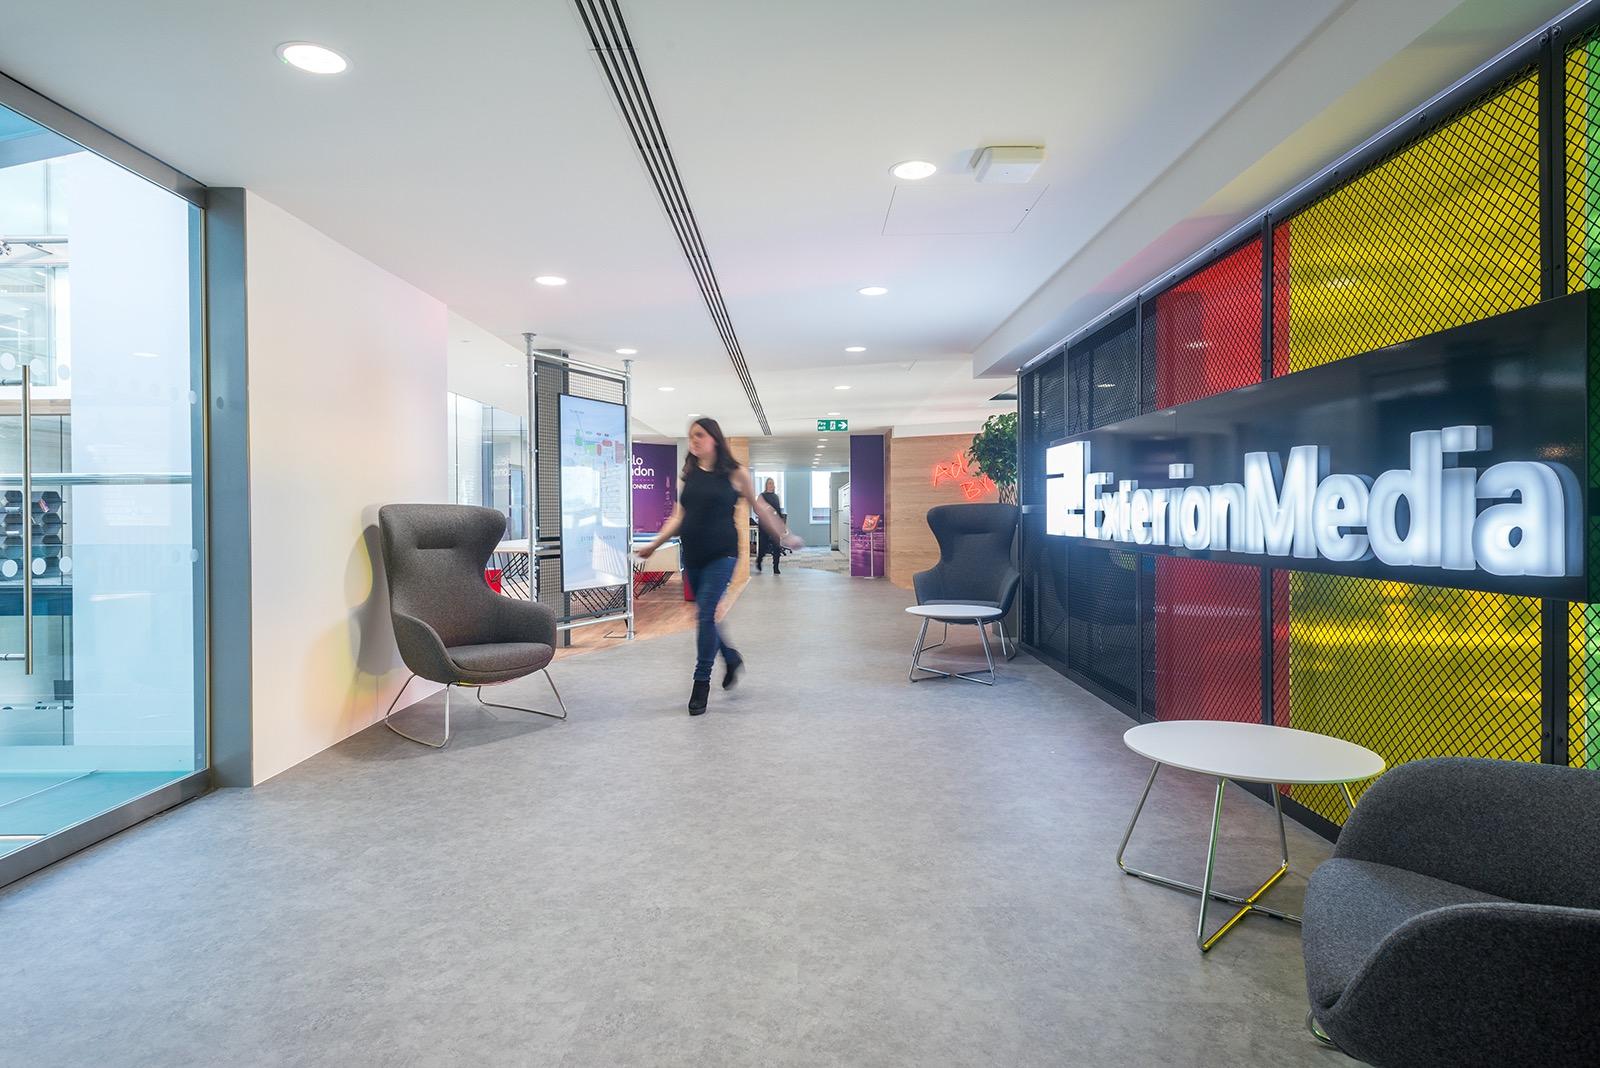 Inside exterion media s cool new london office officelovin 39 for Office design principles